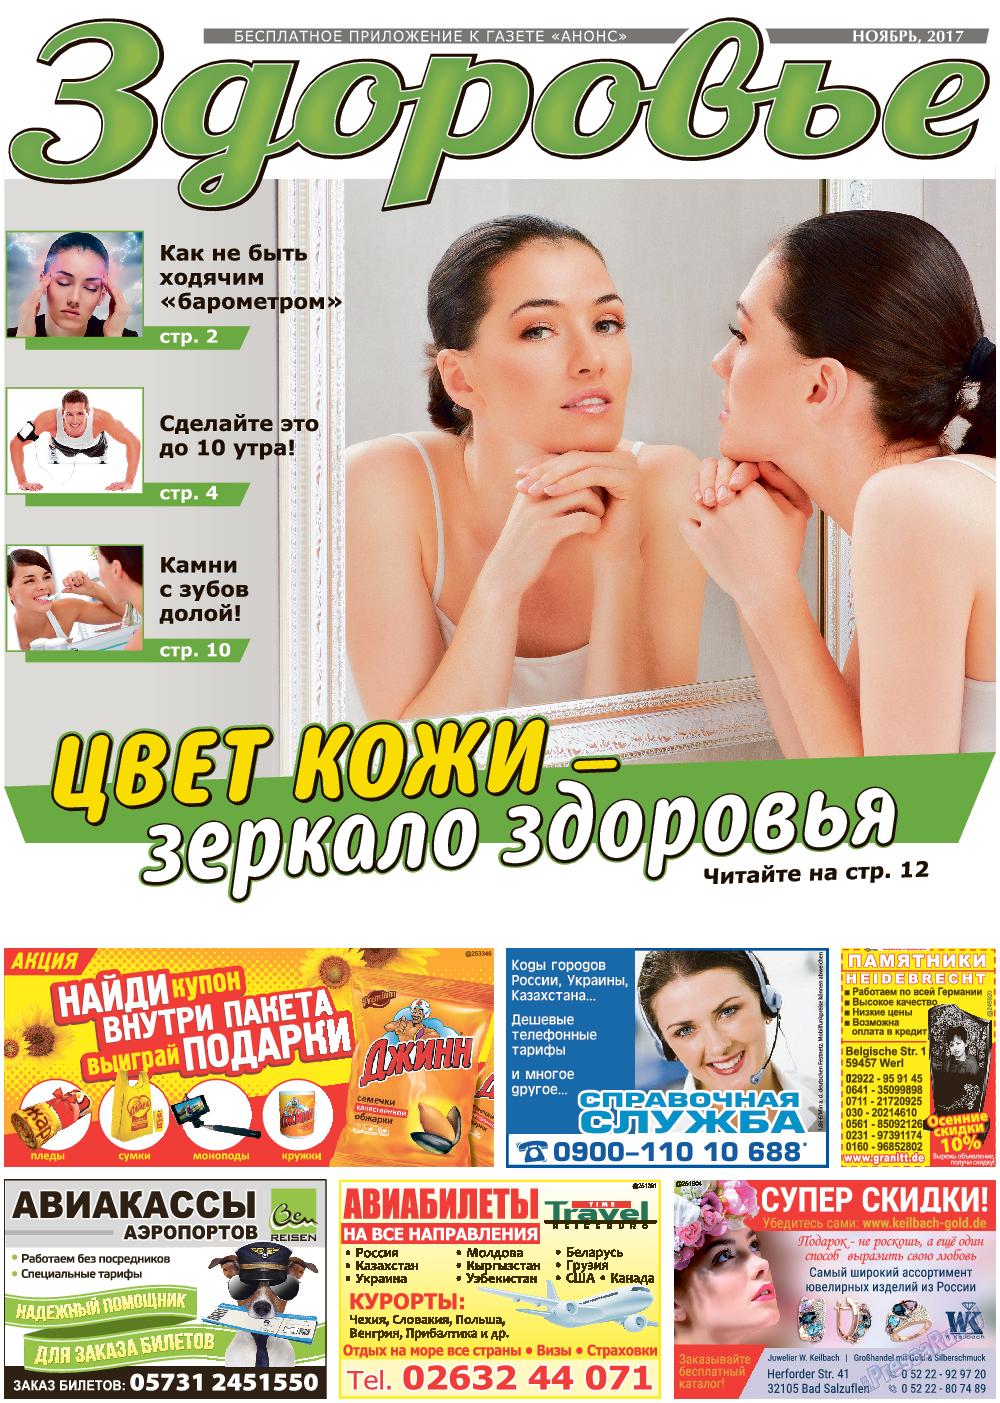 Здоровье (газета). 2017 год, номер 11, стр. 1